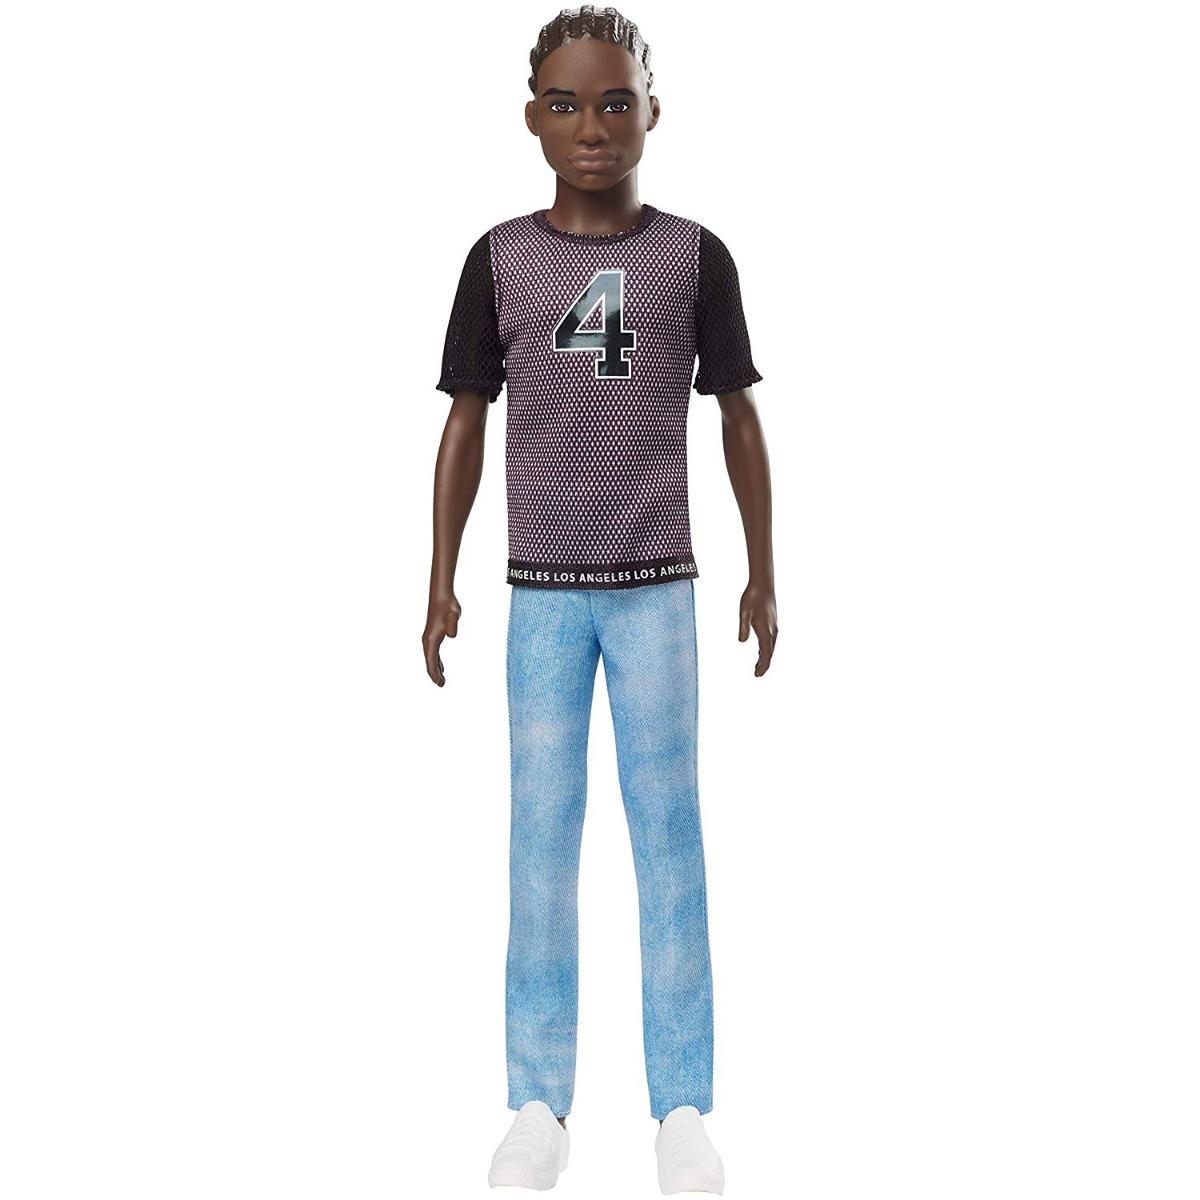 Papusa Barbie Fashionistas - Ken (GDV13)